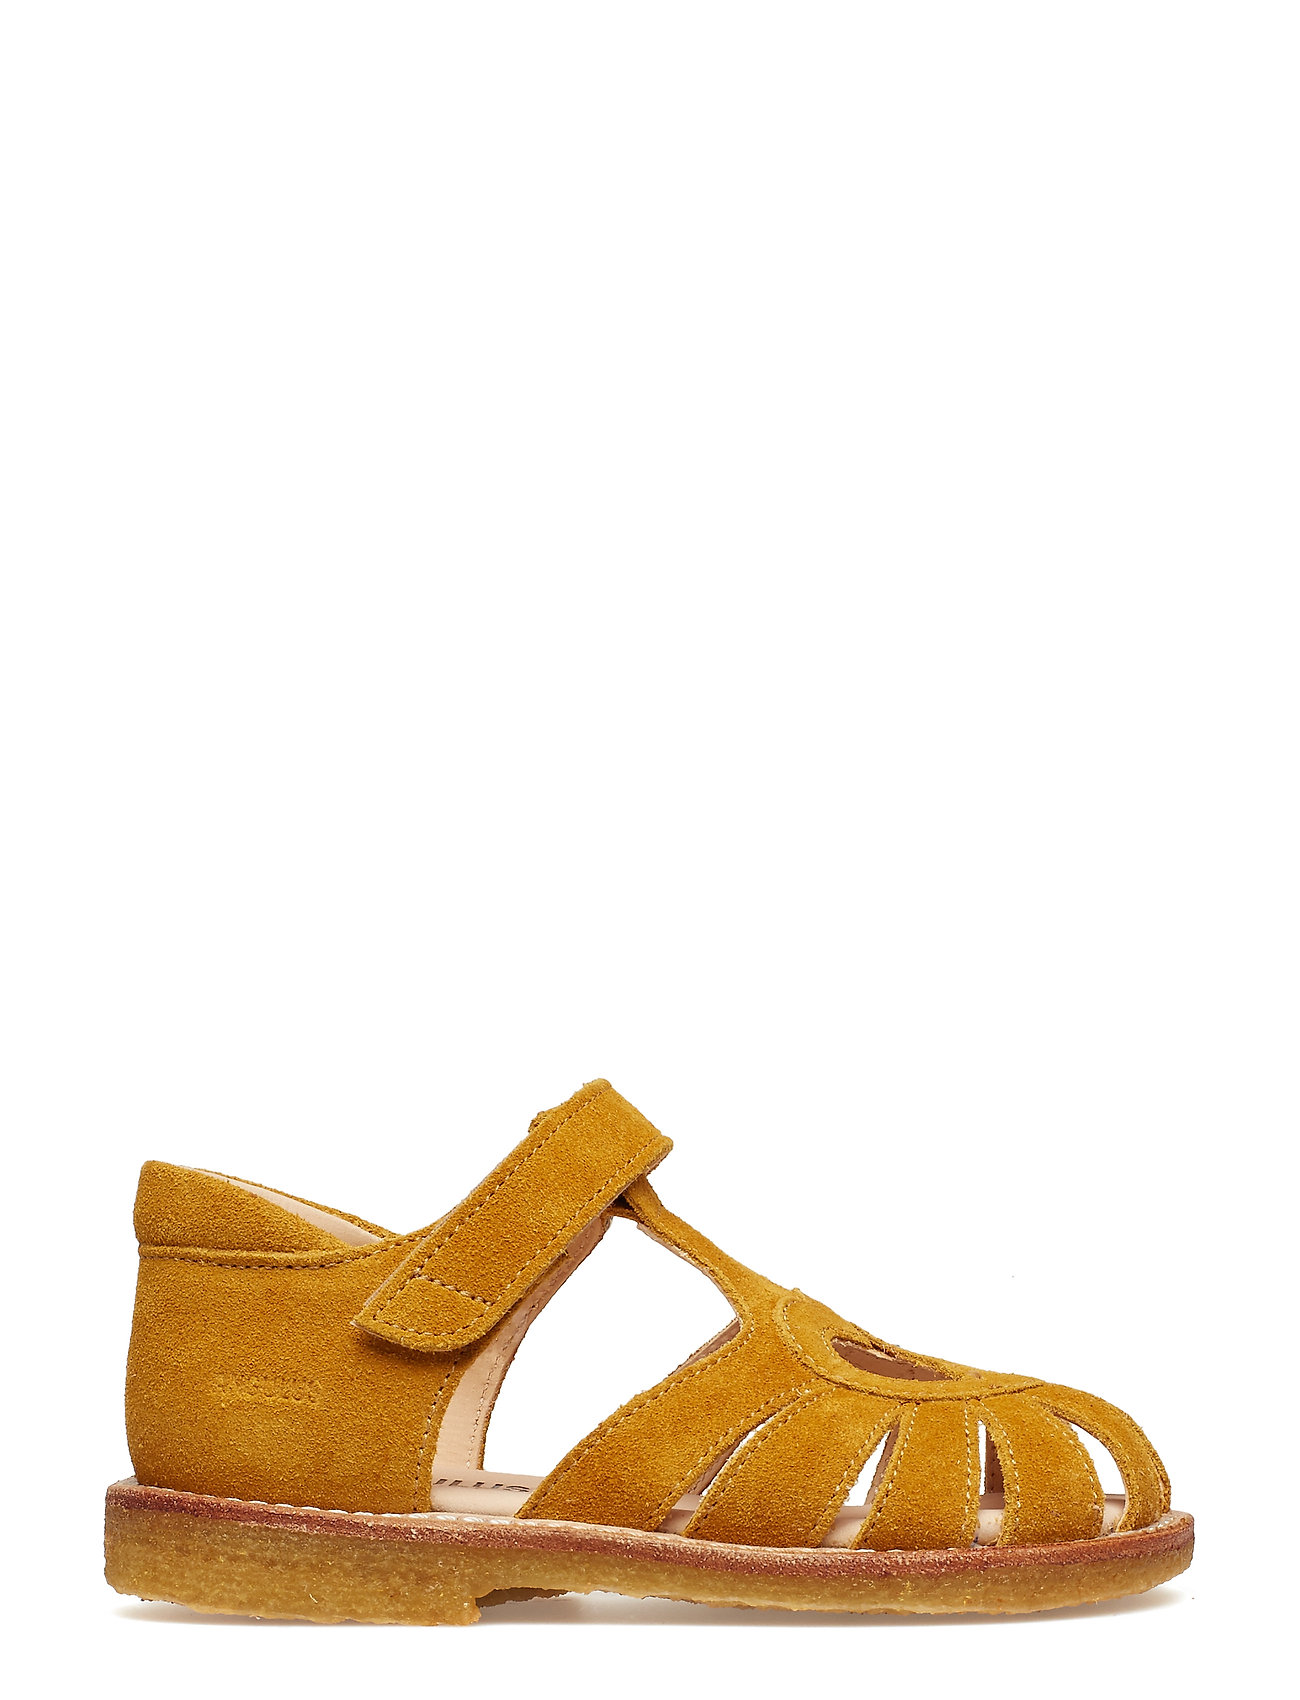 Sandal With Heart Detail Sandaler Gul ANGULUS